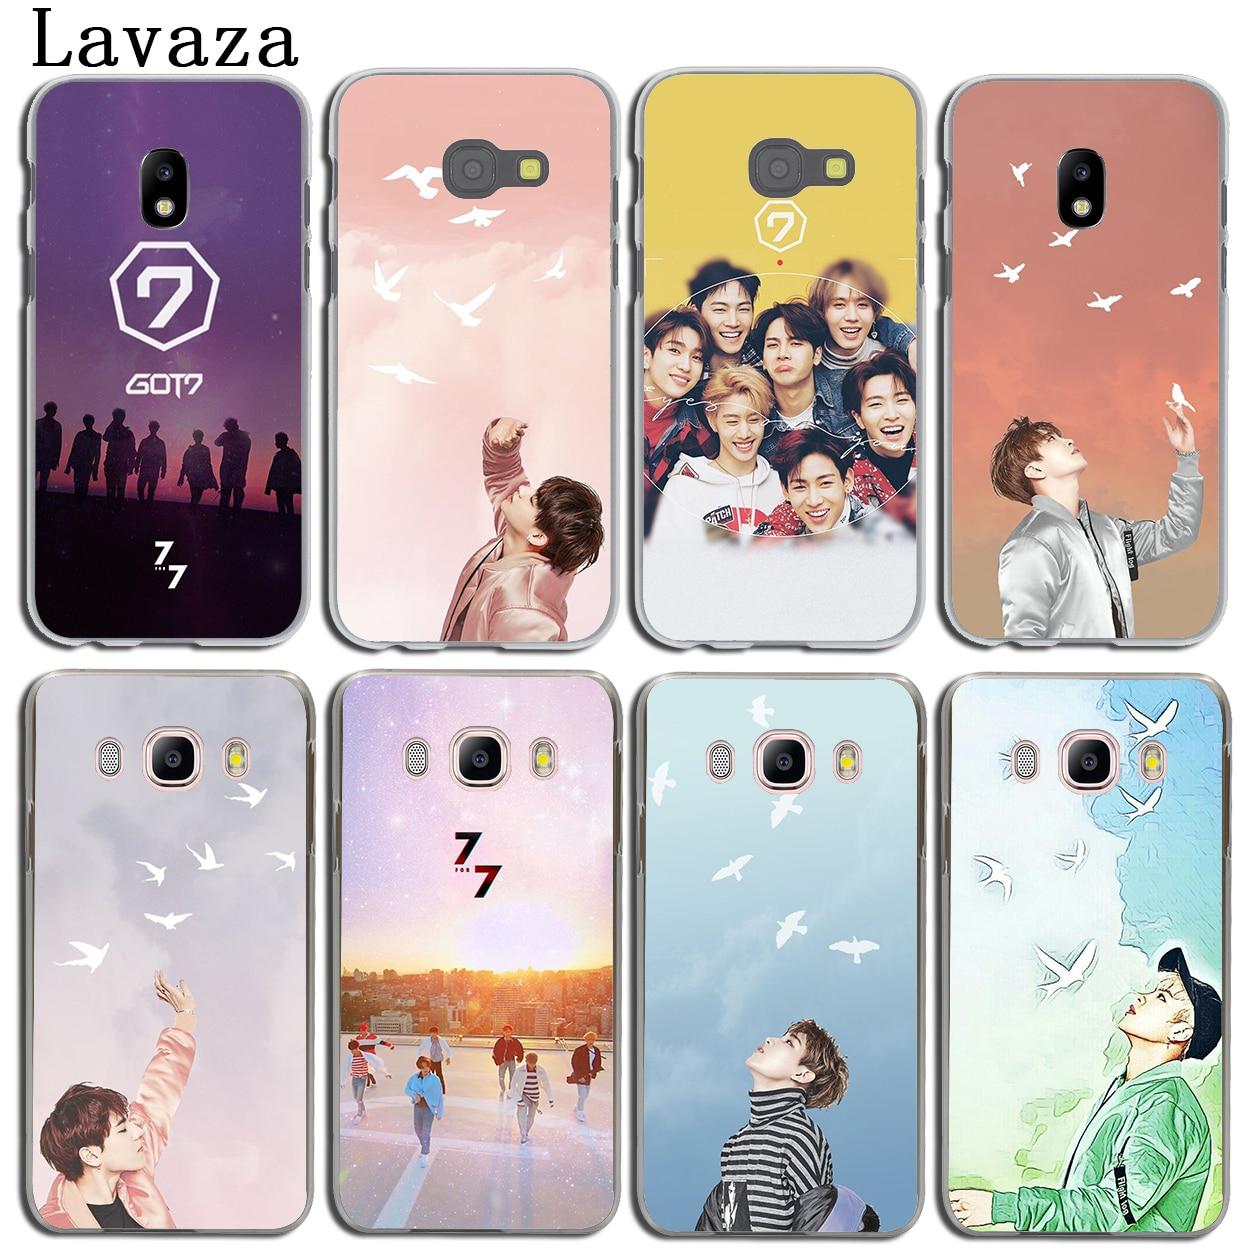 Lavaza GOT7 Jackson JinYoung got 7 Phone Shell Case for Samsung Galaxy J3 J1 J2 J7 J5 2015 2016 2017 J2 Pro Ace J7 J5 Prime Case